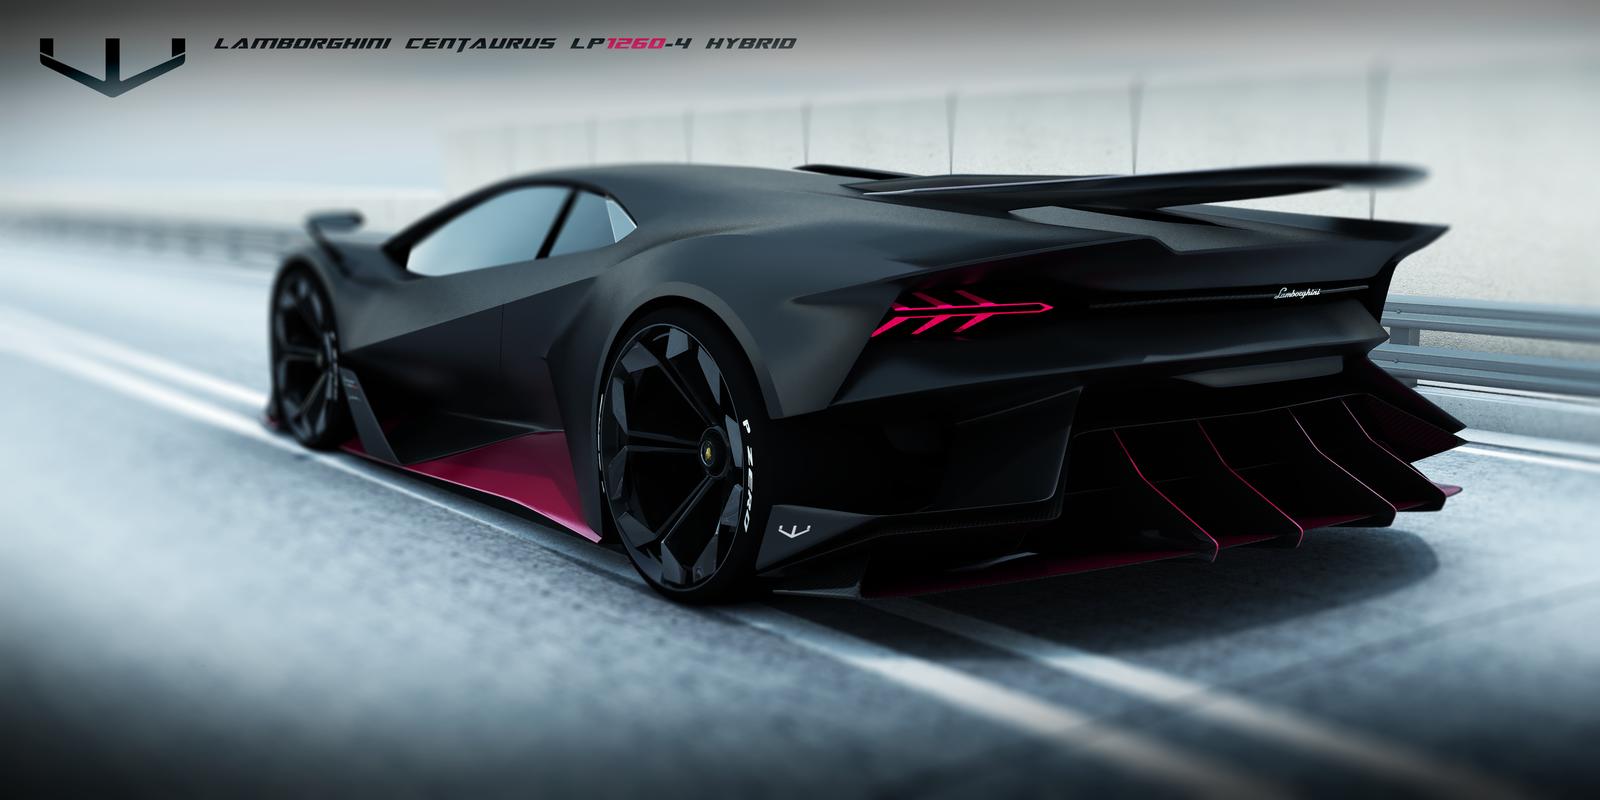 Lamborghini Centaurus hypercar | 創藝 | Pinterest ...